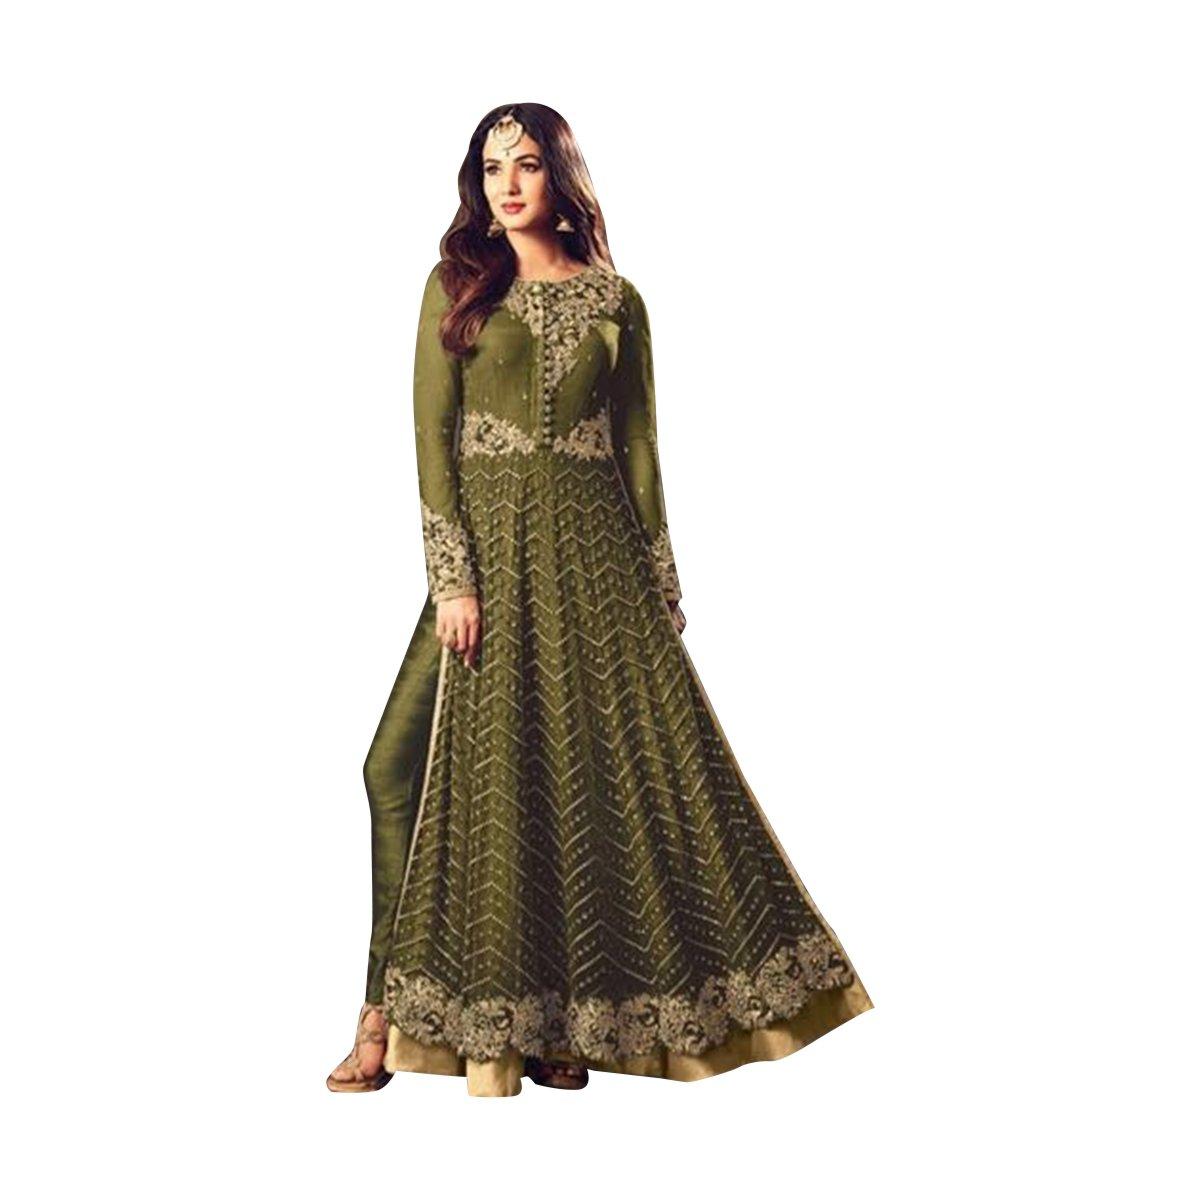 Latest Designer Sexy Party Wear Wedding Bridal Anarkali Long Gown Suit Saree Sari Women Dress 514